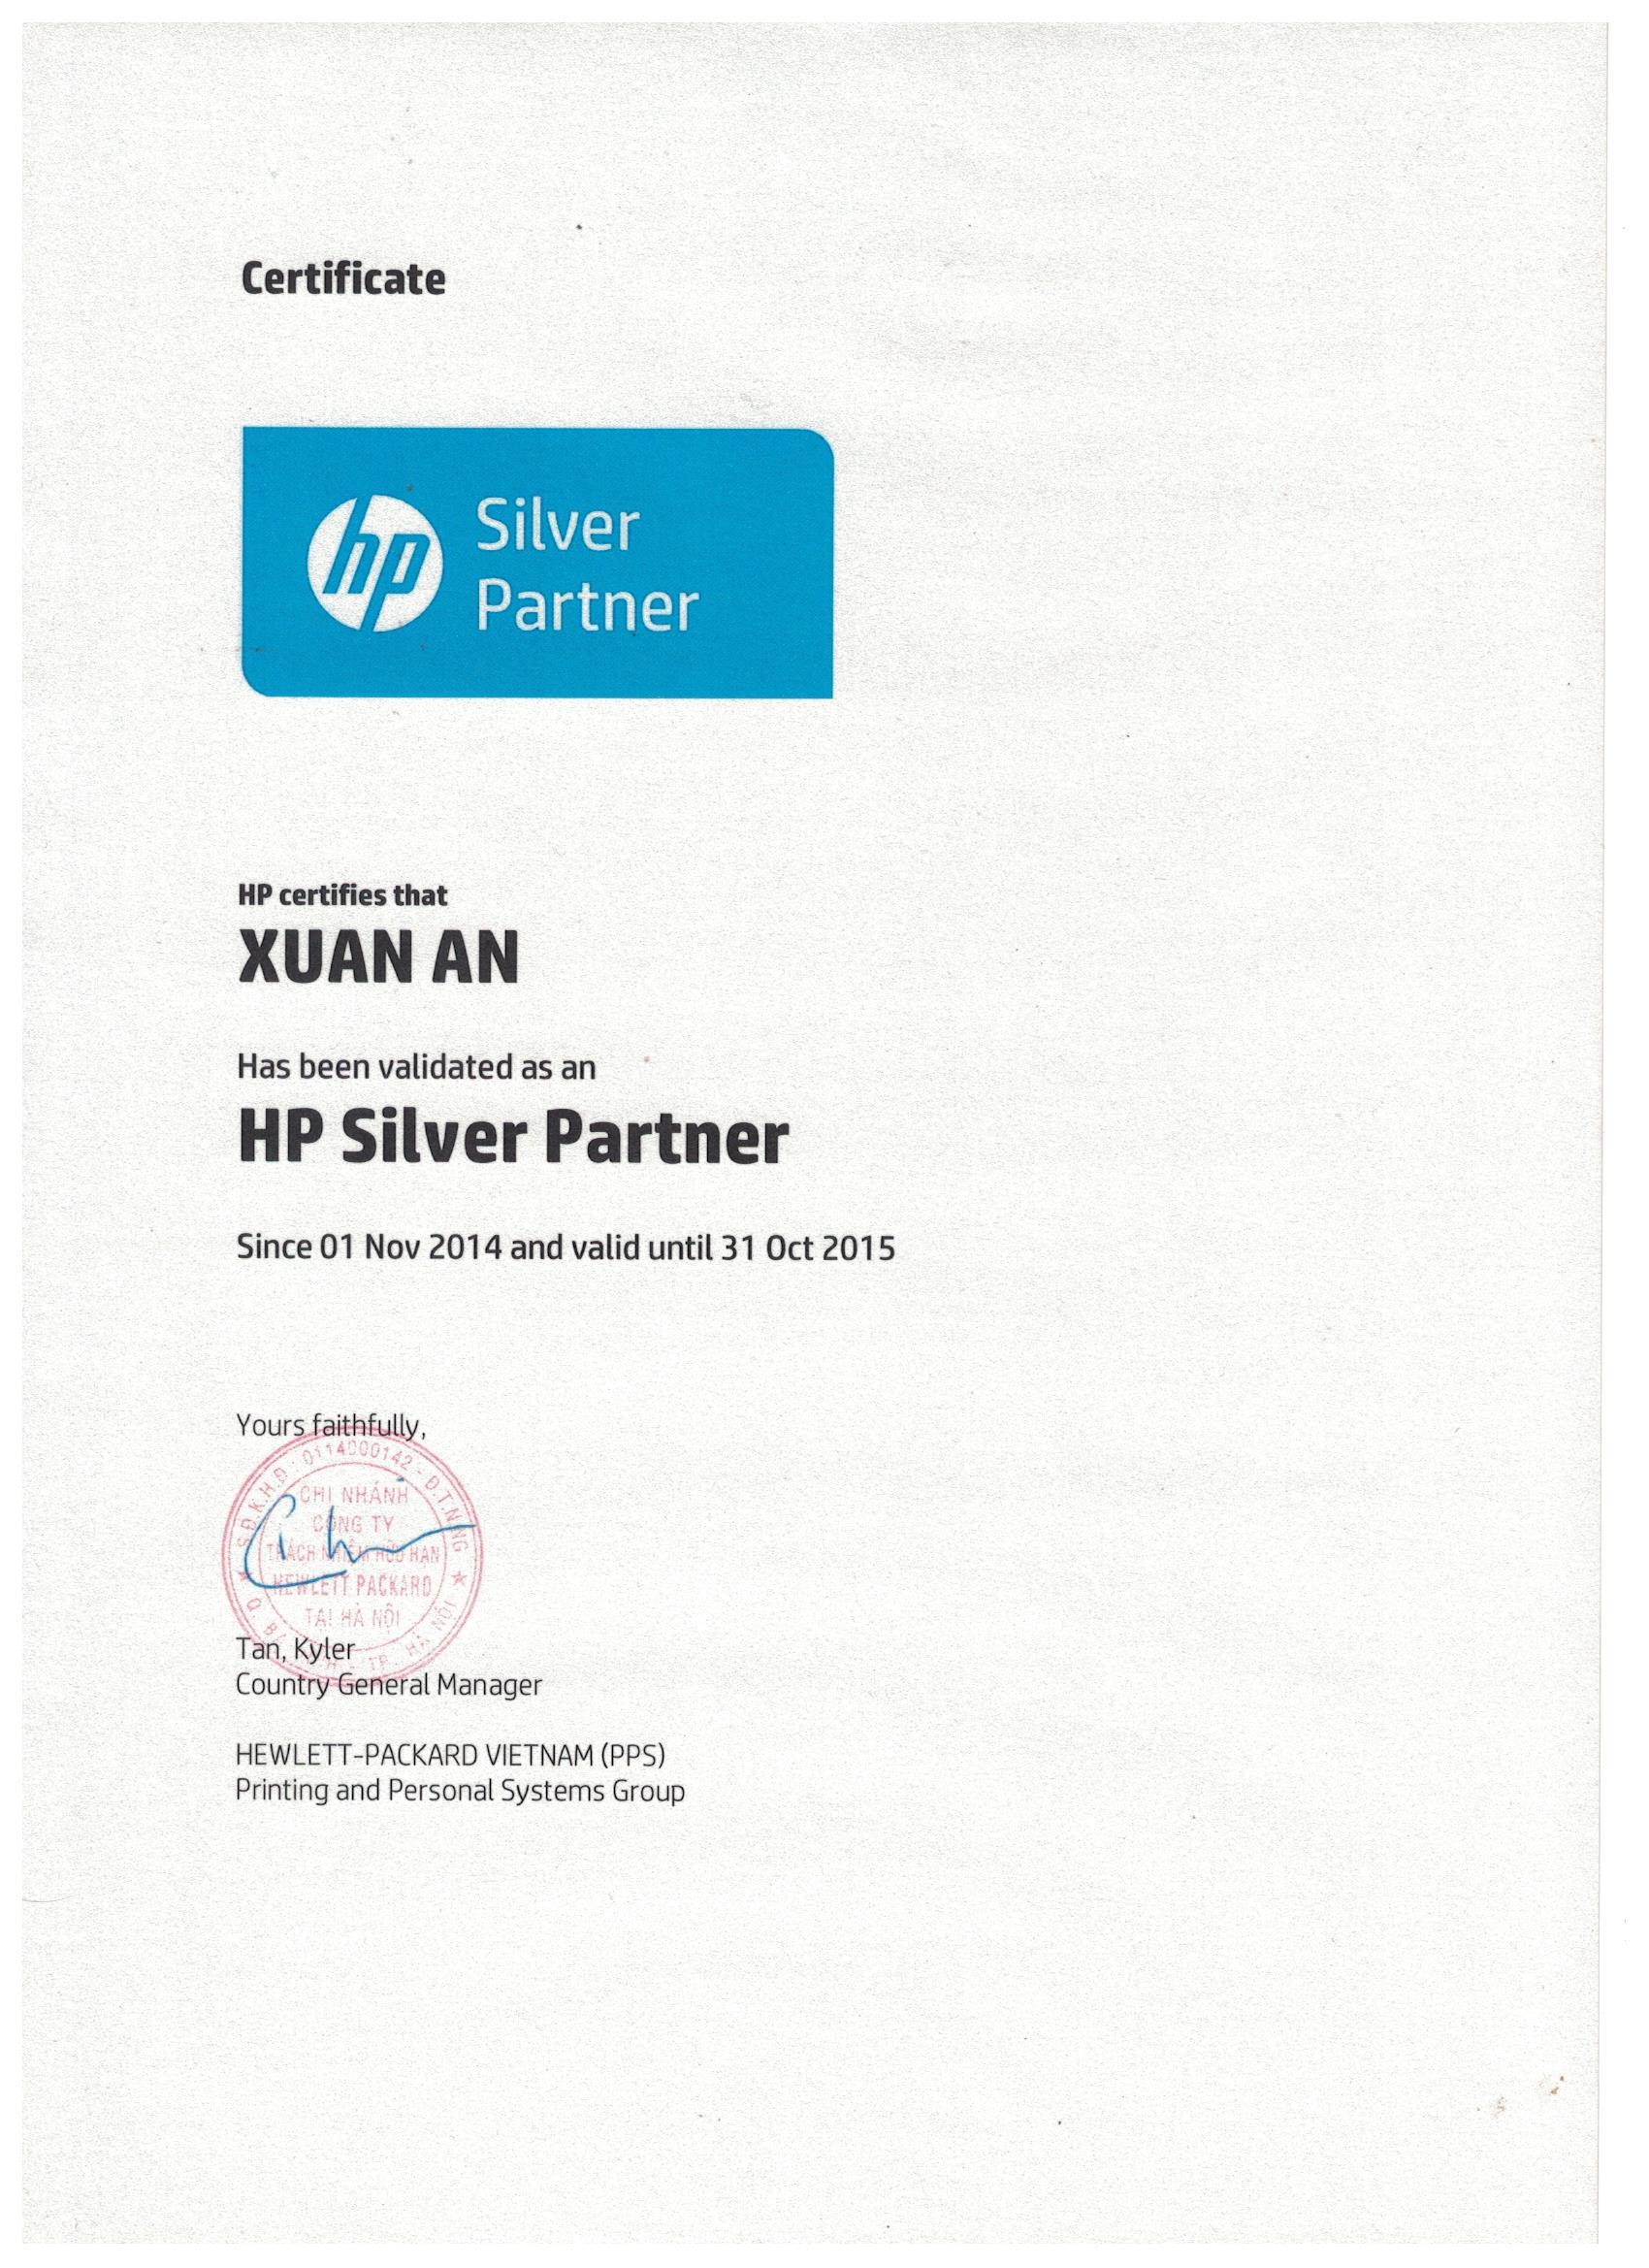 HP Probook 430 G7 - 9GQ02PA (Silver)